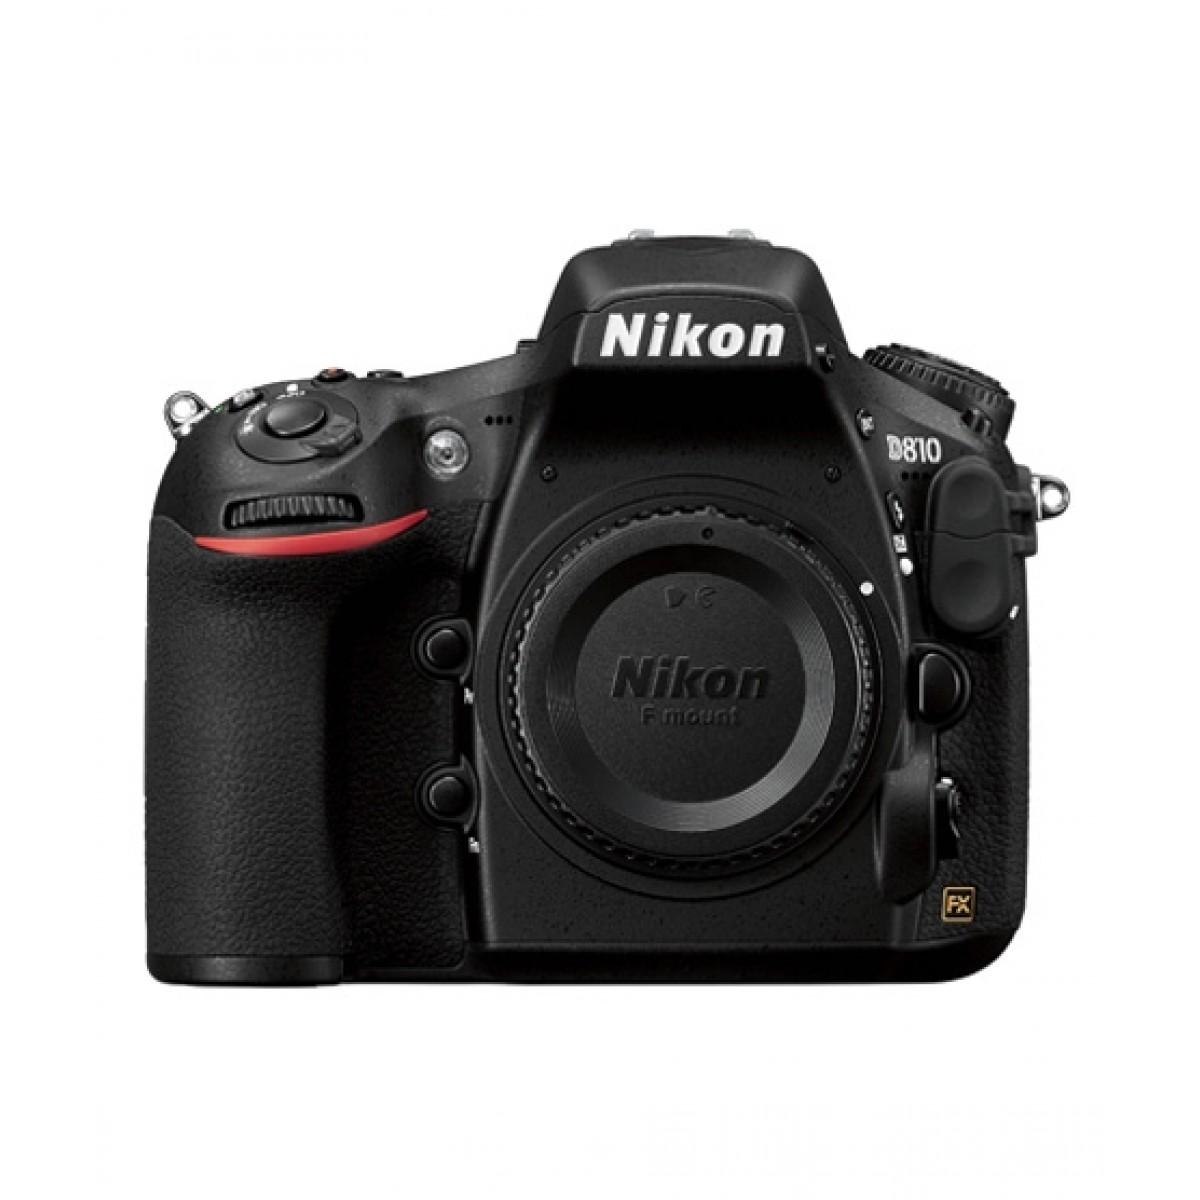 Nikon D810 DSLR Camera (Body Only) - Official Warranty